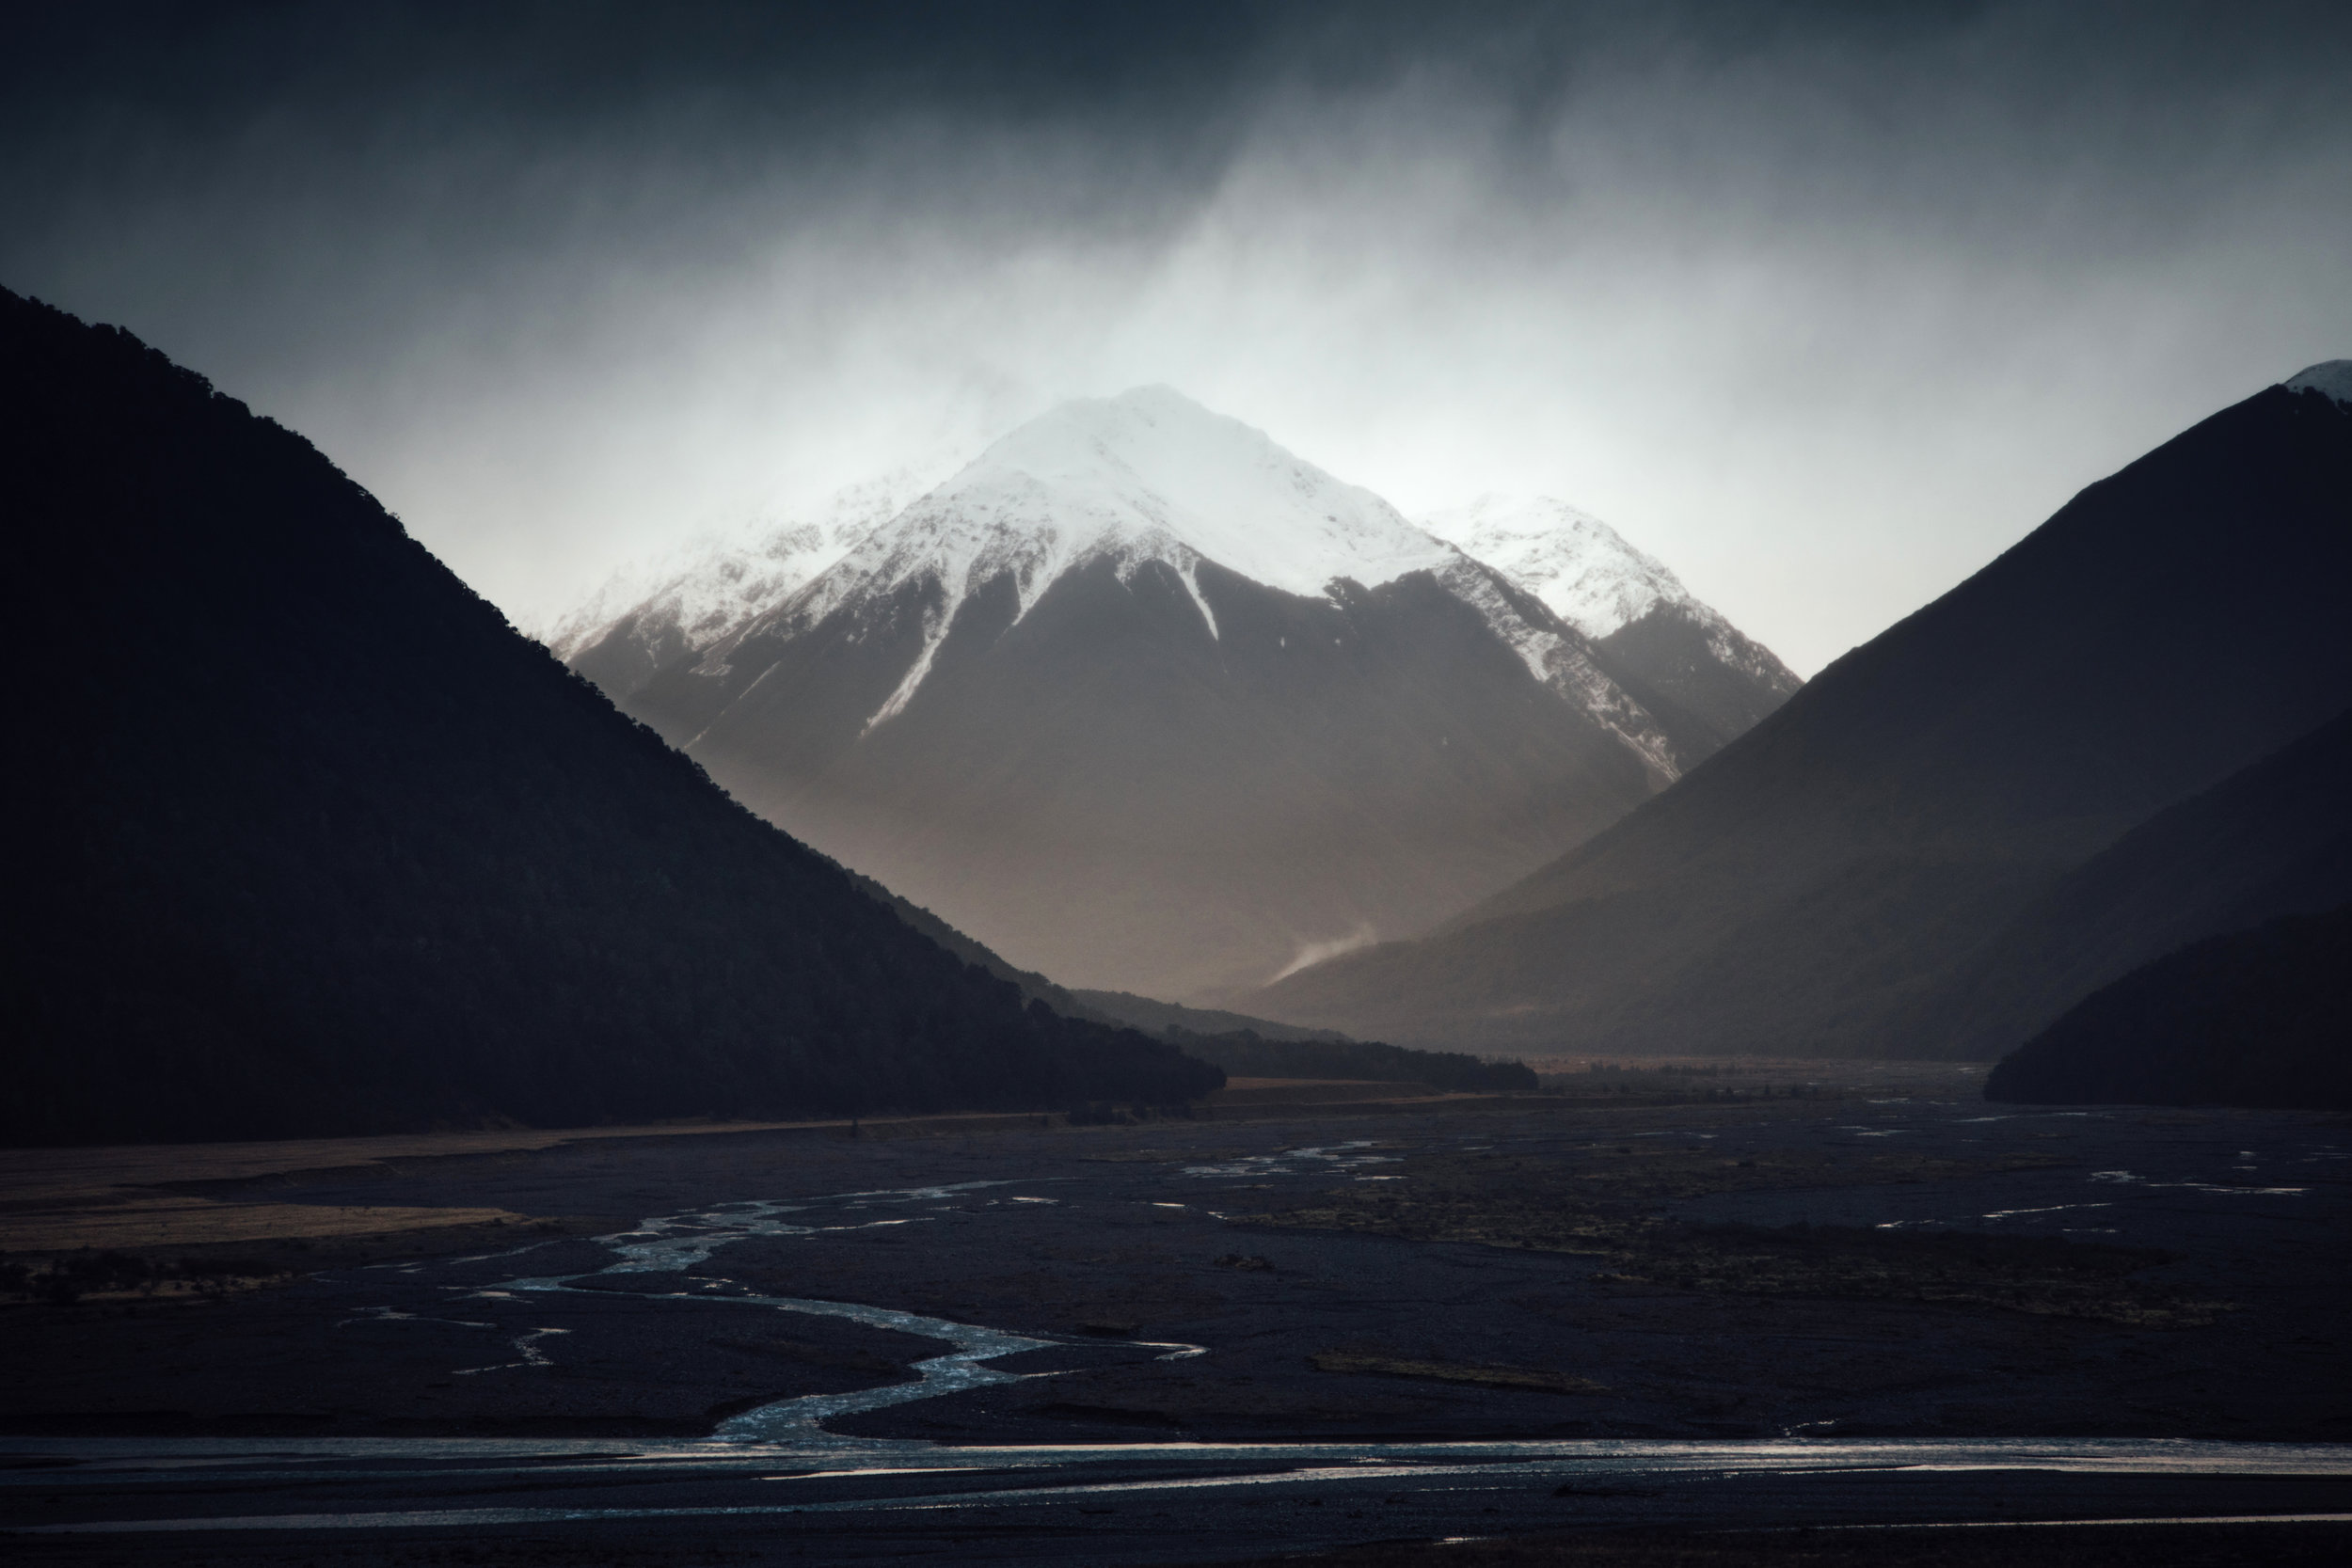 New-Zealand-a-photo-essay-rucksack-magazine